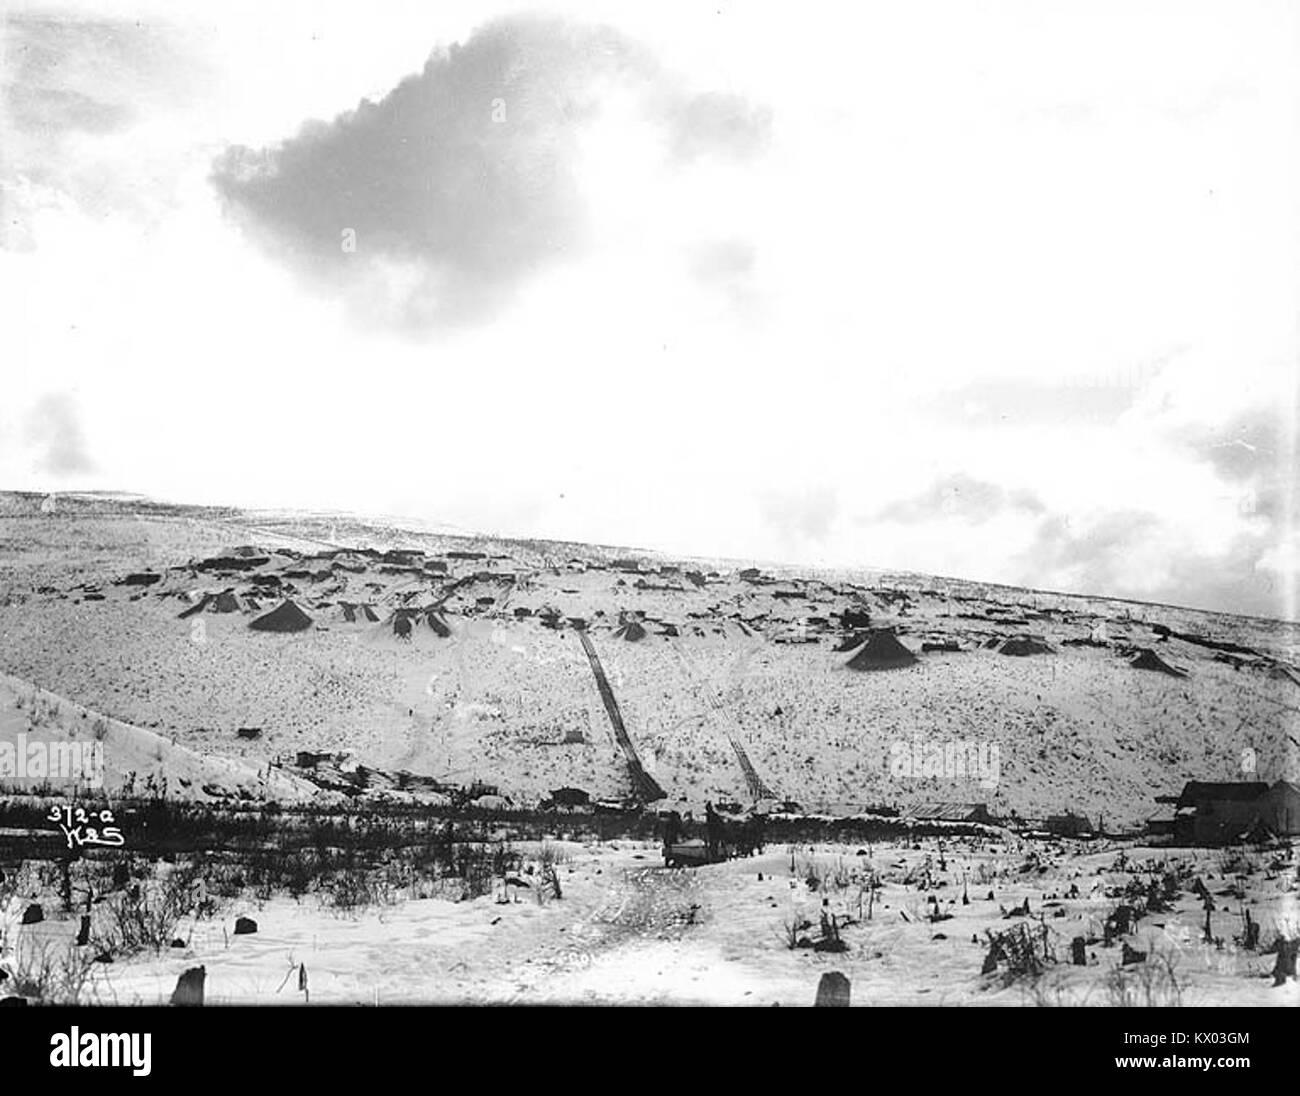 Mining claims on Gold Hill, Yukon Territory, ca 1898 (HEGG 315) - Stock Image